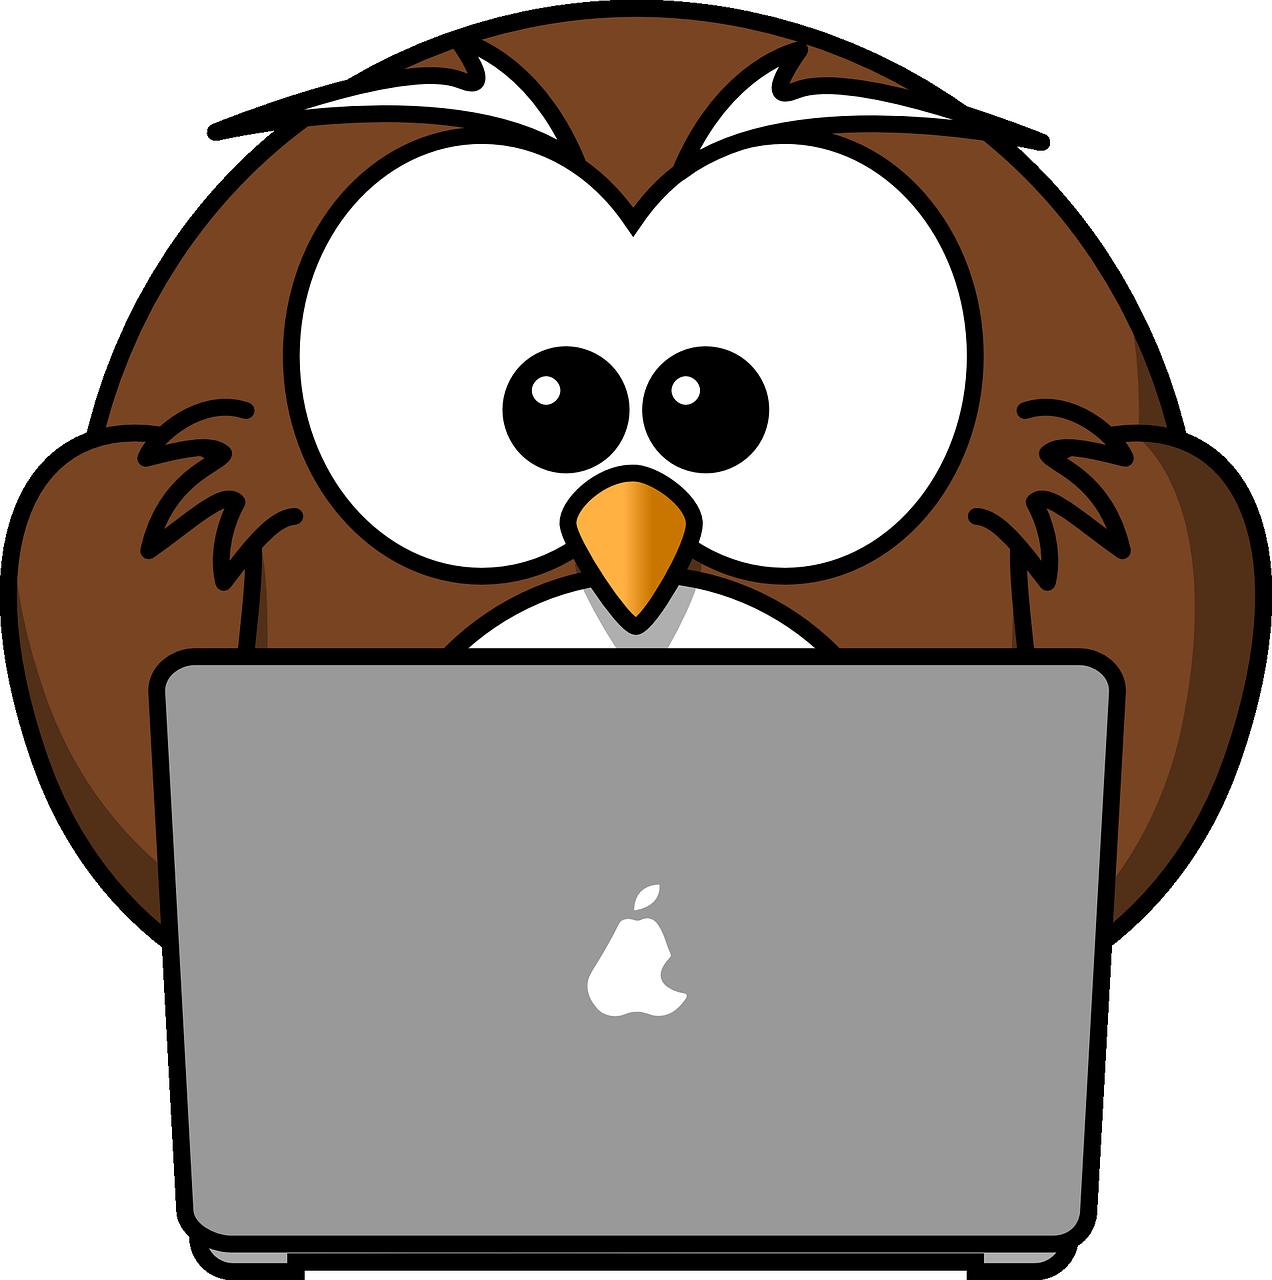 Online scavenger hunt ideas. Hunting clipart bird hunter